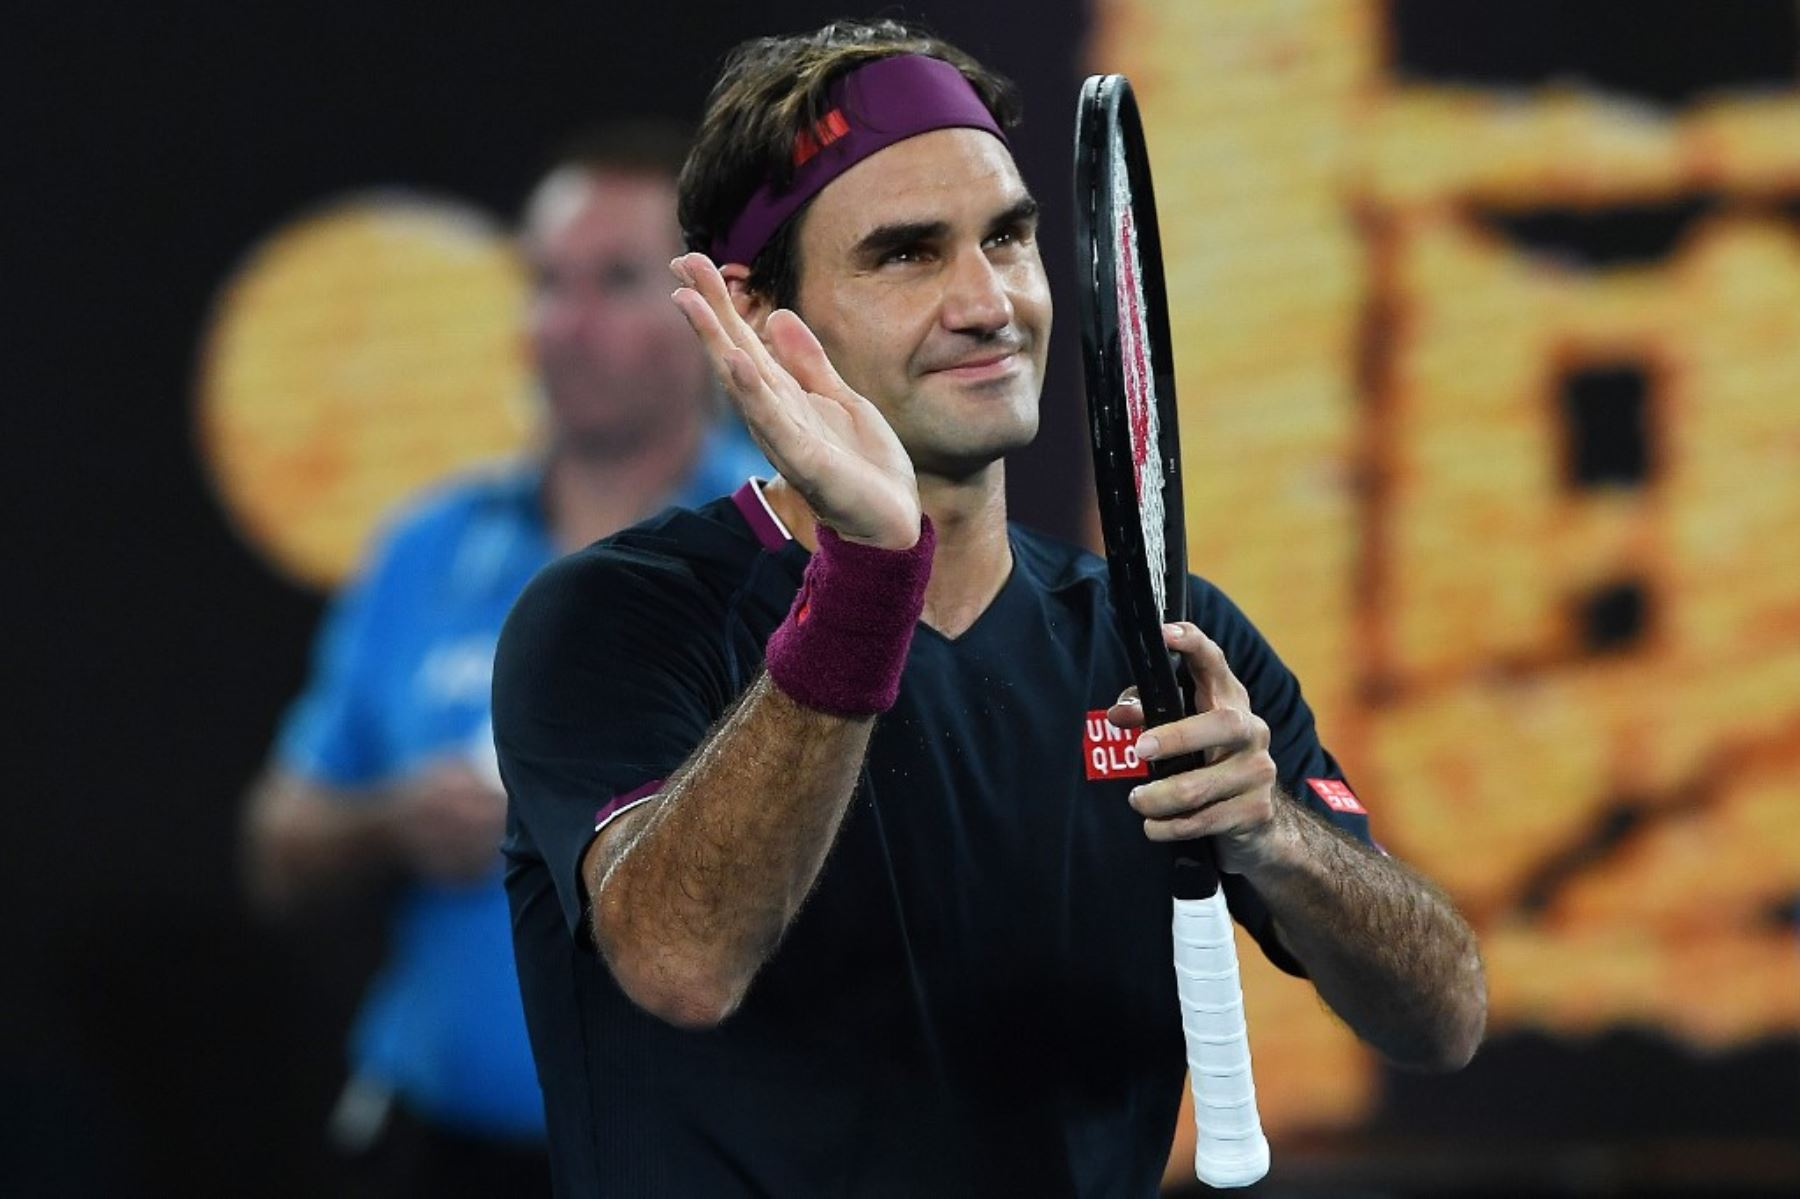 Roger Federer avanza a paso firme en el Abierto de Australia